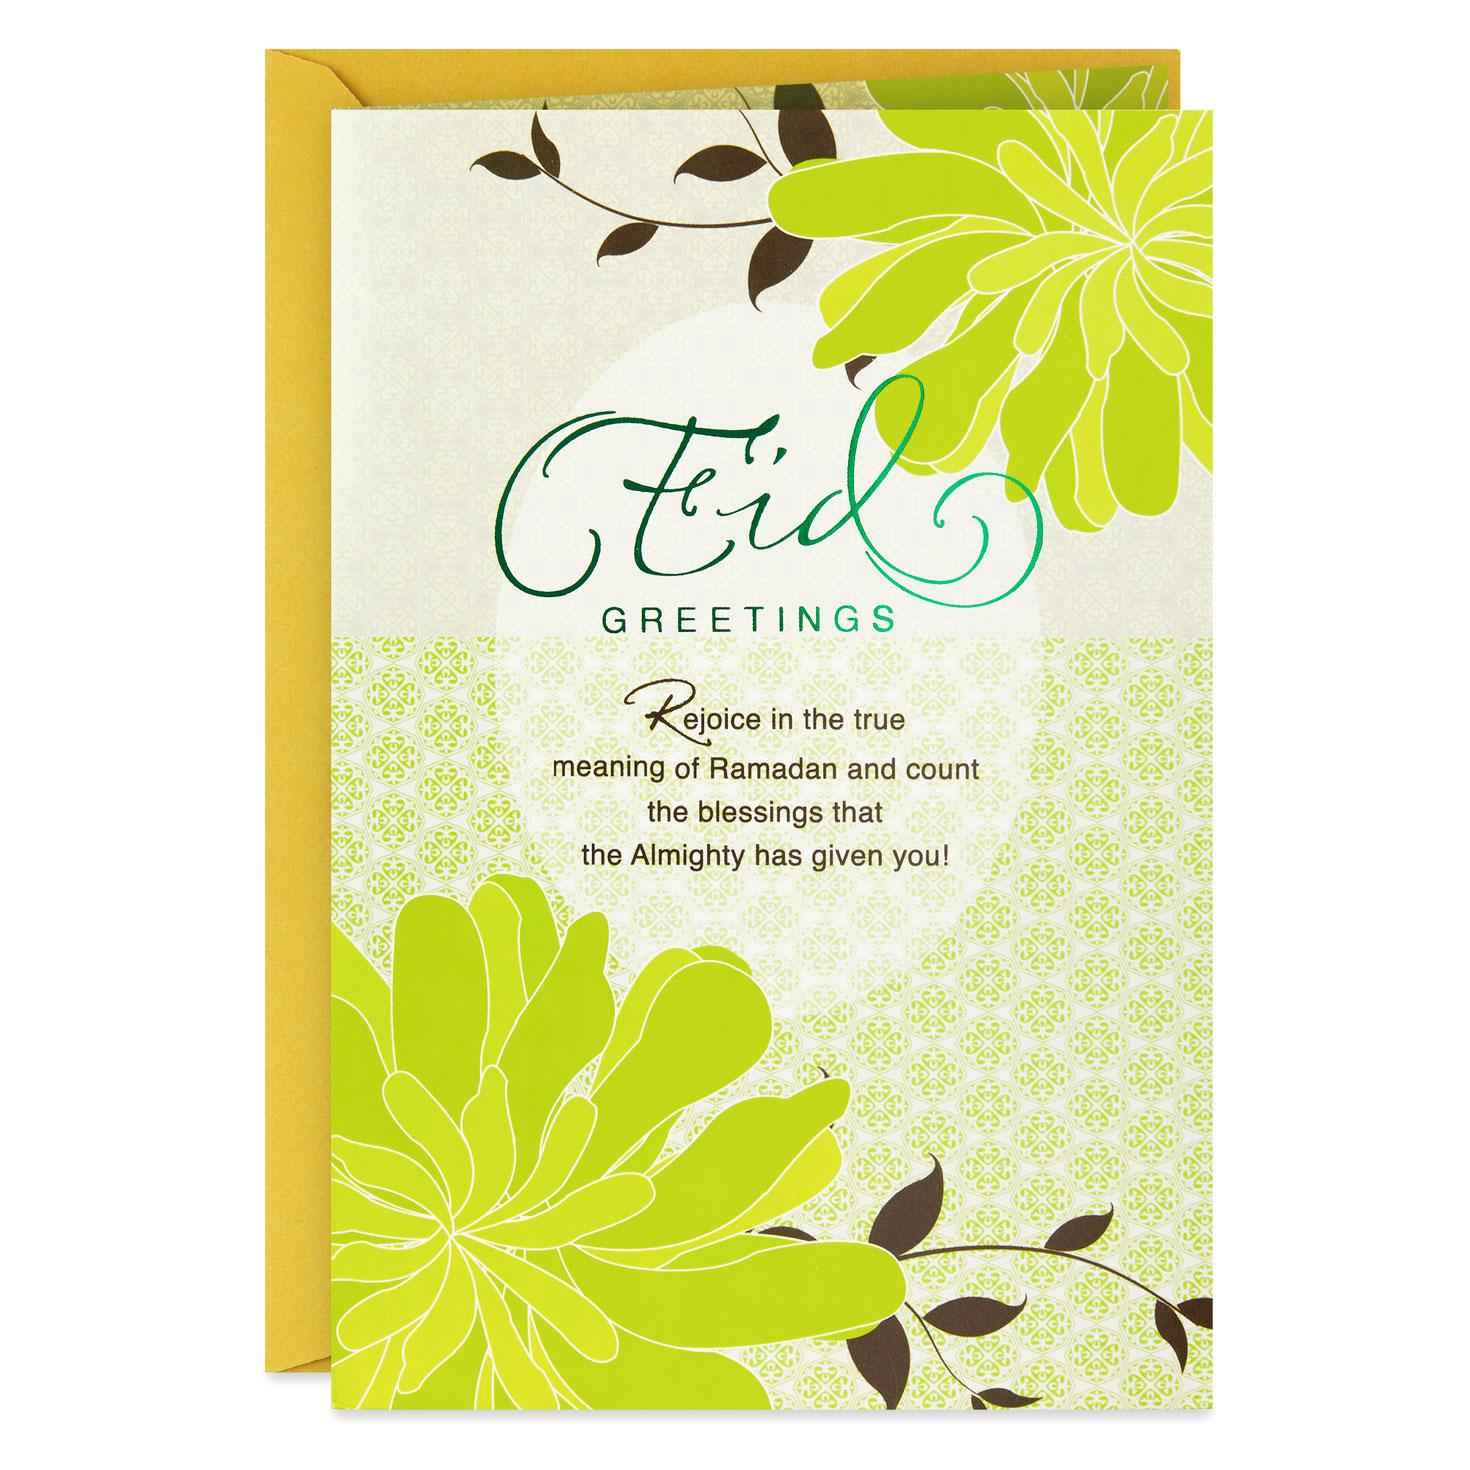 Green Flowers Happiness Eid Card - Greeting Cards - Hallmark